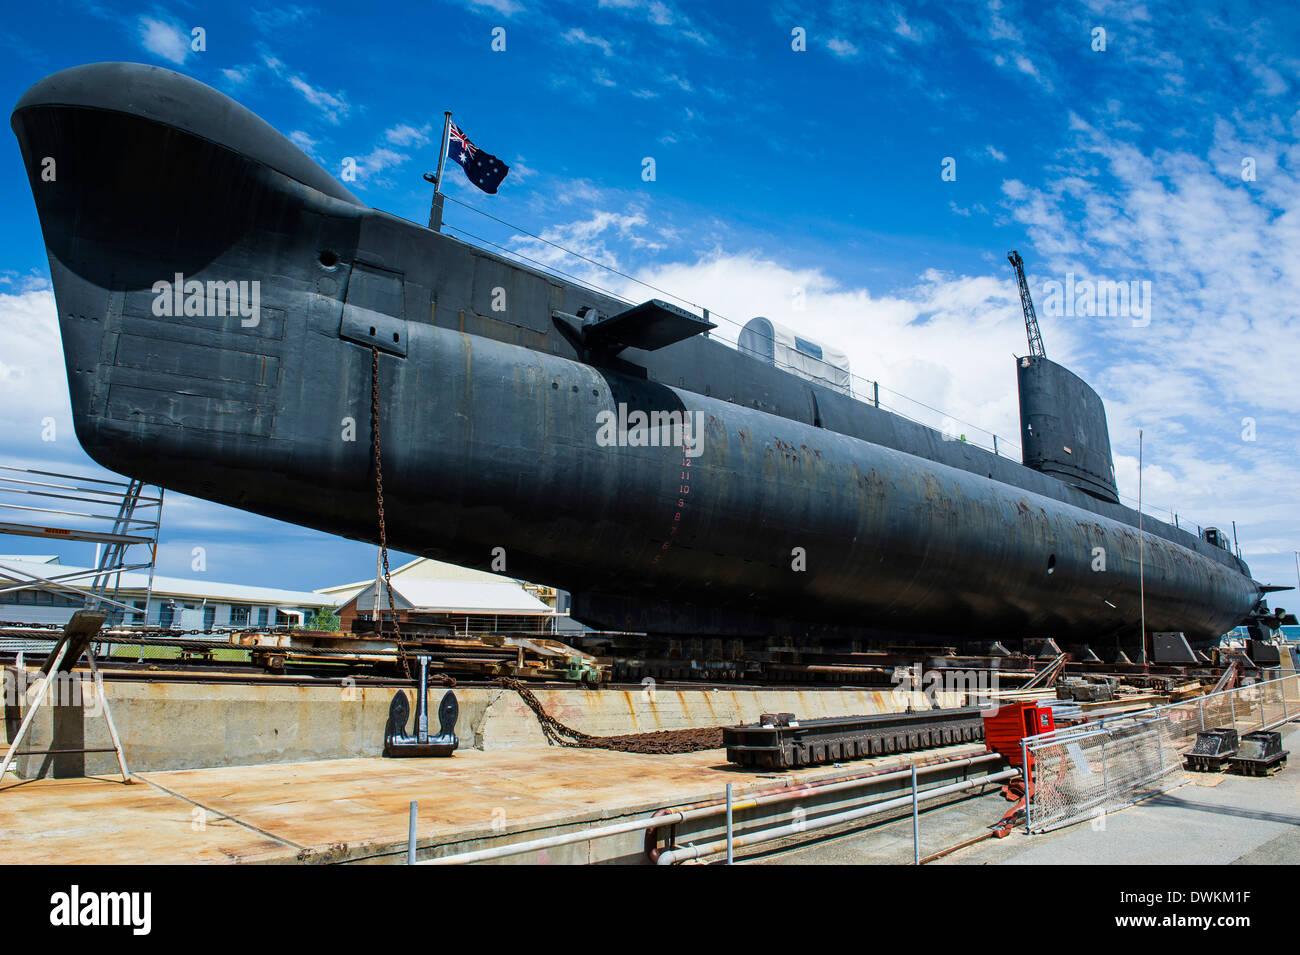 HMAS Ovens Submarine in the Western Australian Maritime Museum, Fremantle, Western Australia, Australia, Pacific - Stock Image